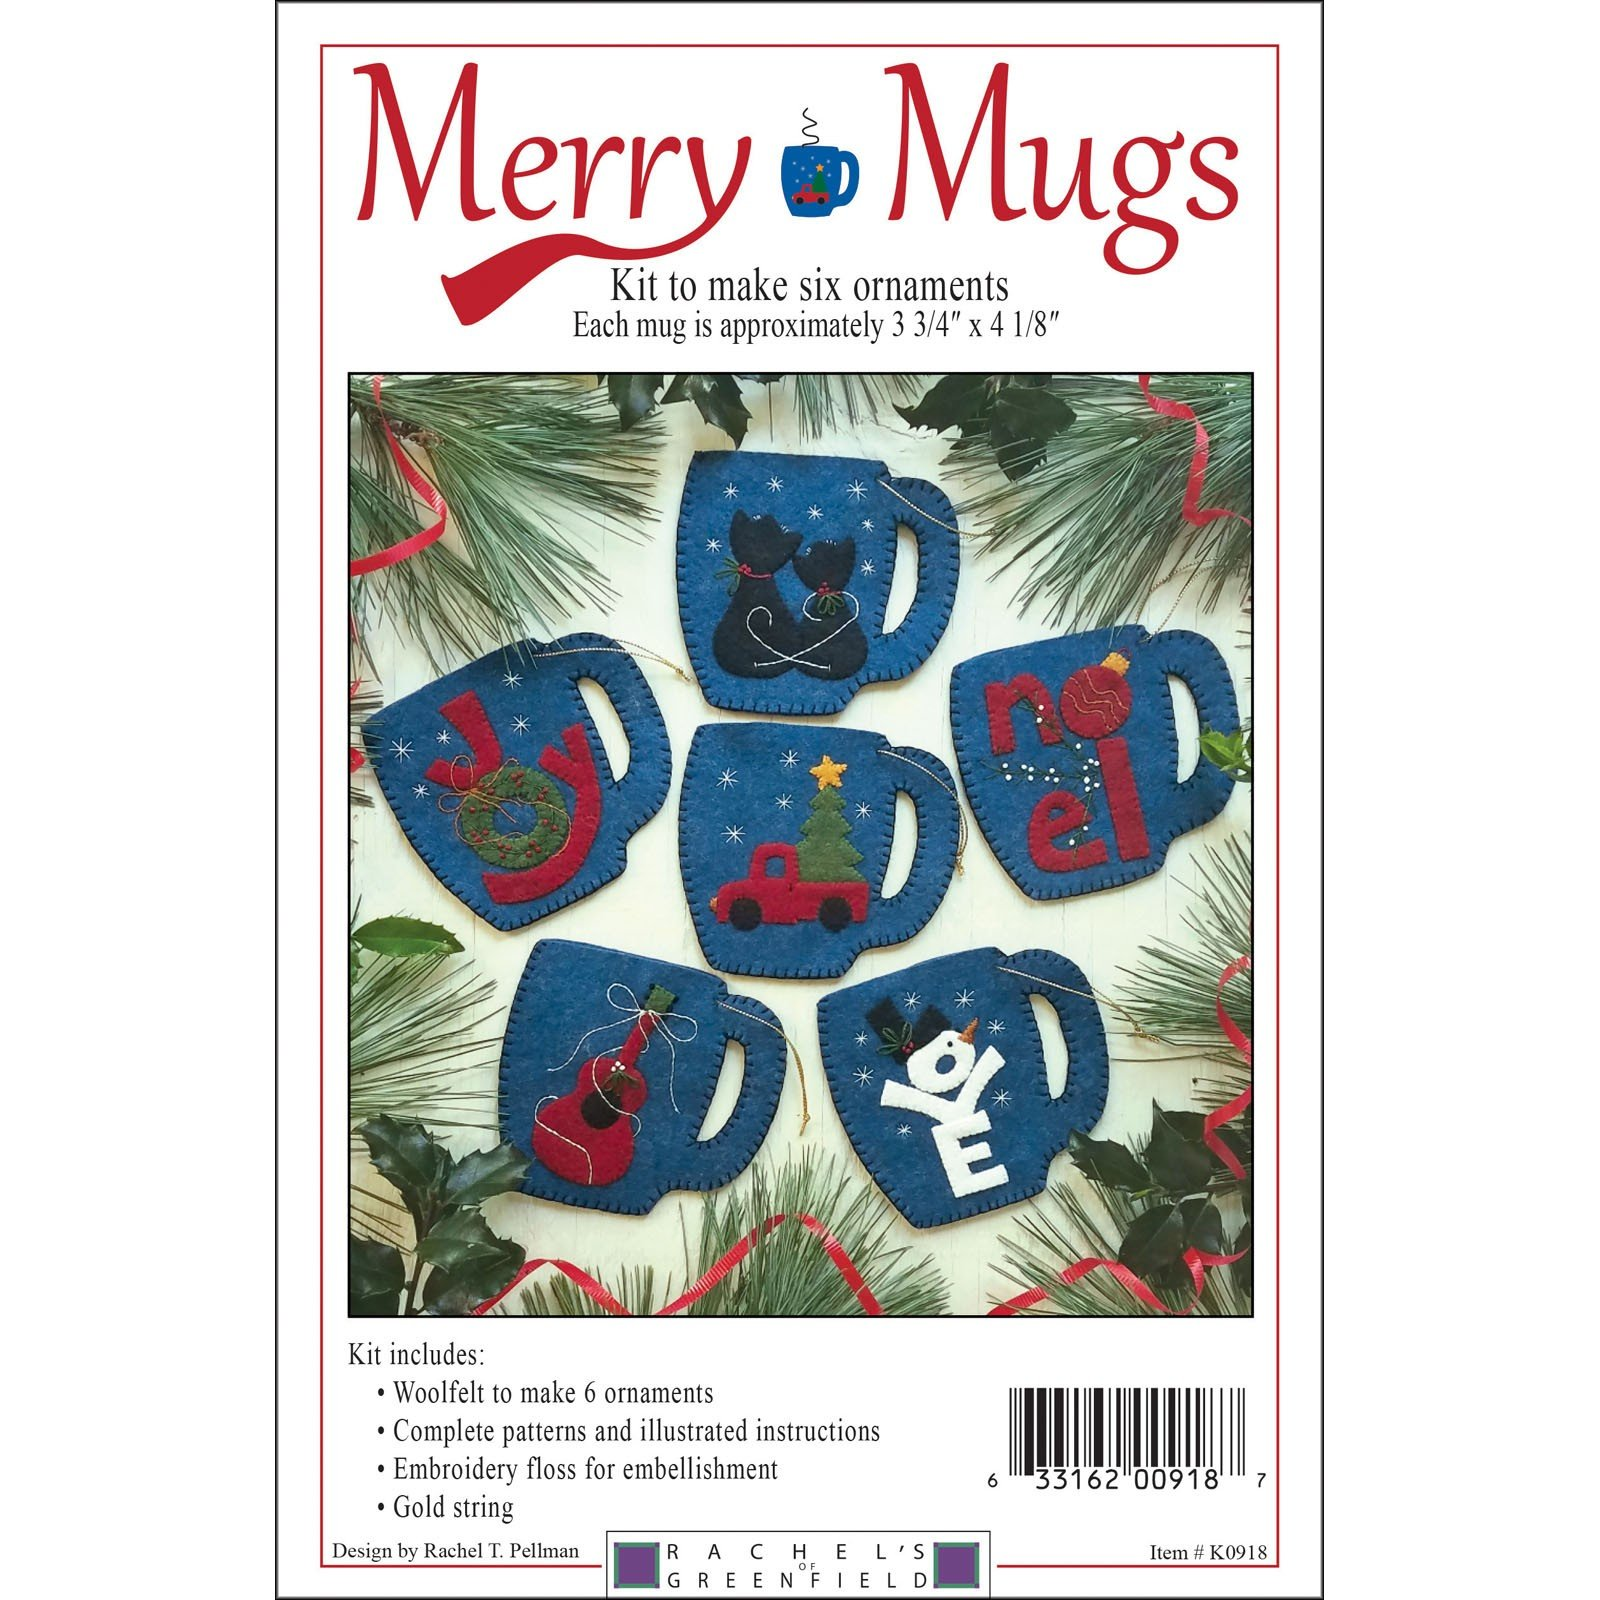 Merry Mugs Woolfelt Ornament Pattern Kit